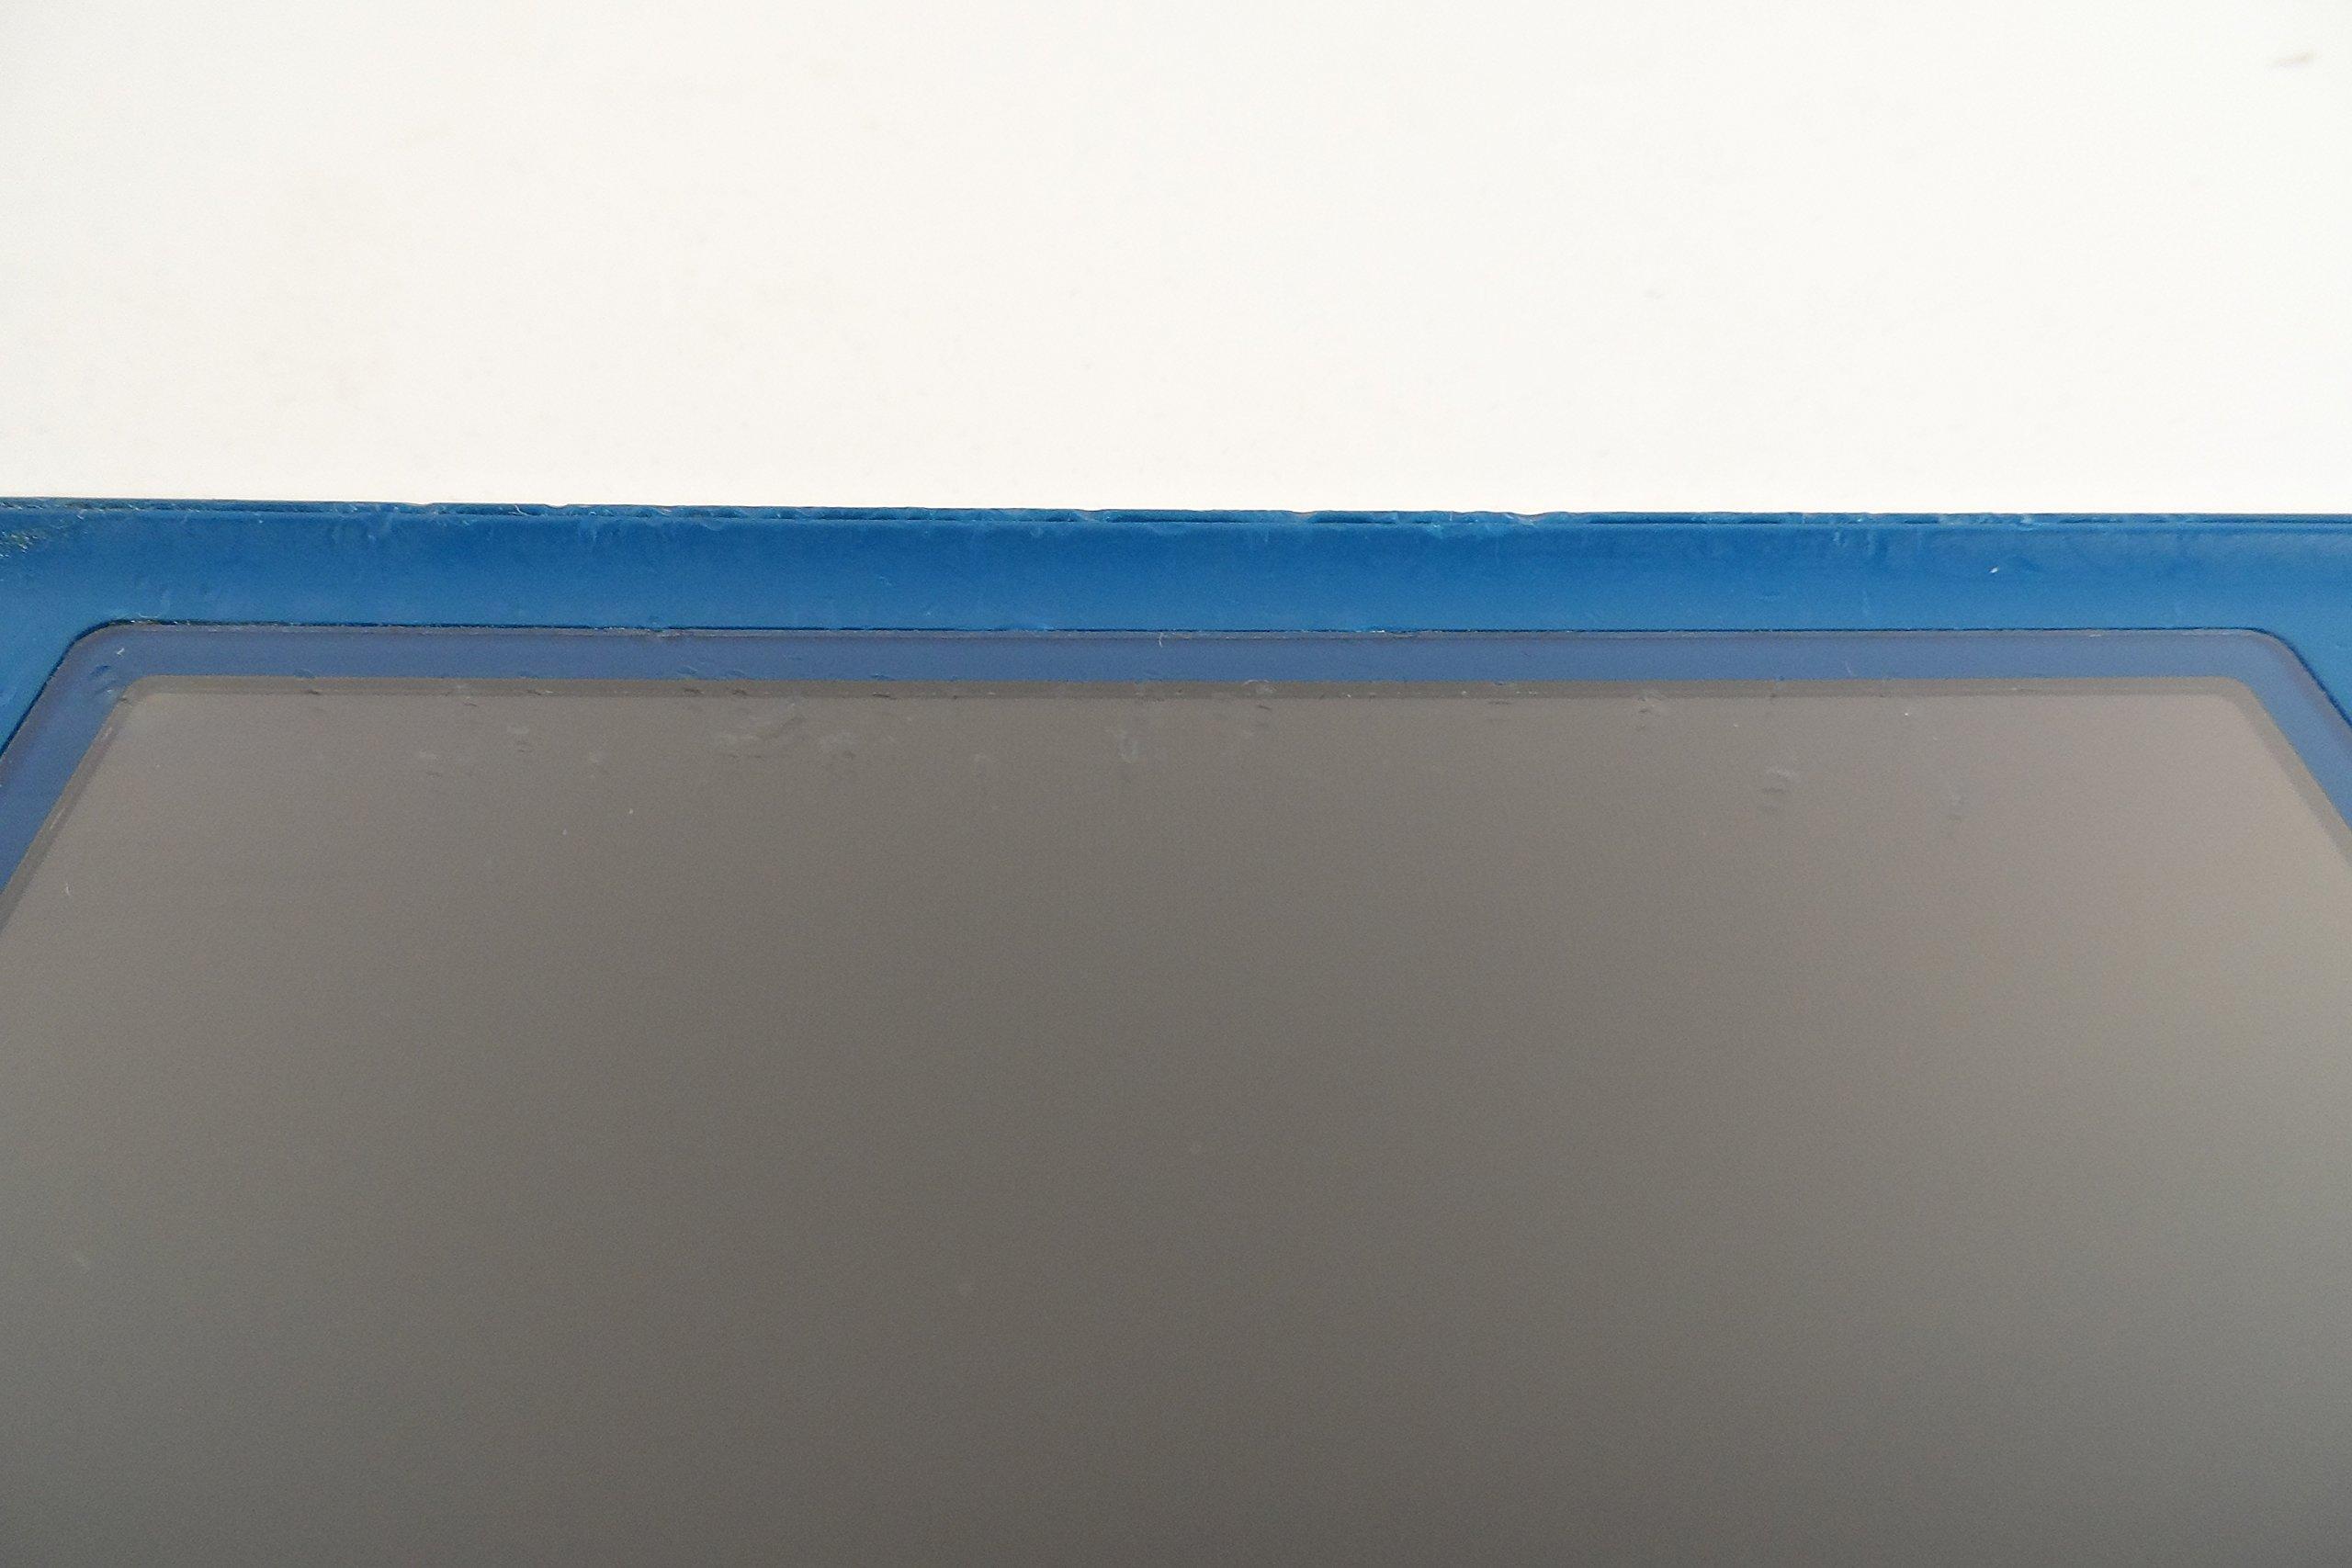 Nintendo DSi 3.25'' LCD Display Game System - Matte Blue by Nintendo (Image #4)